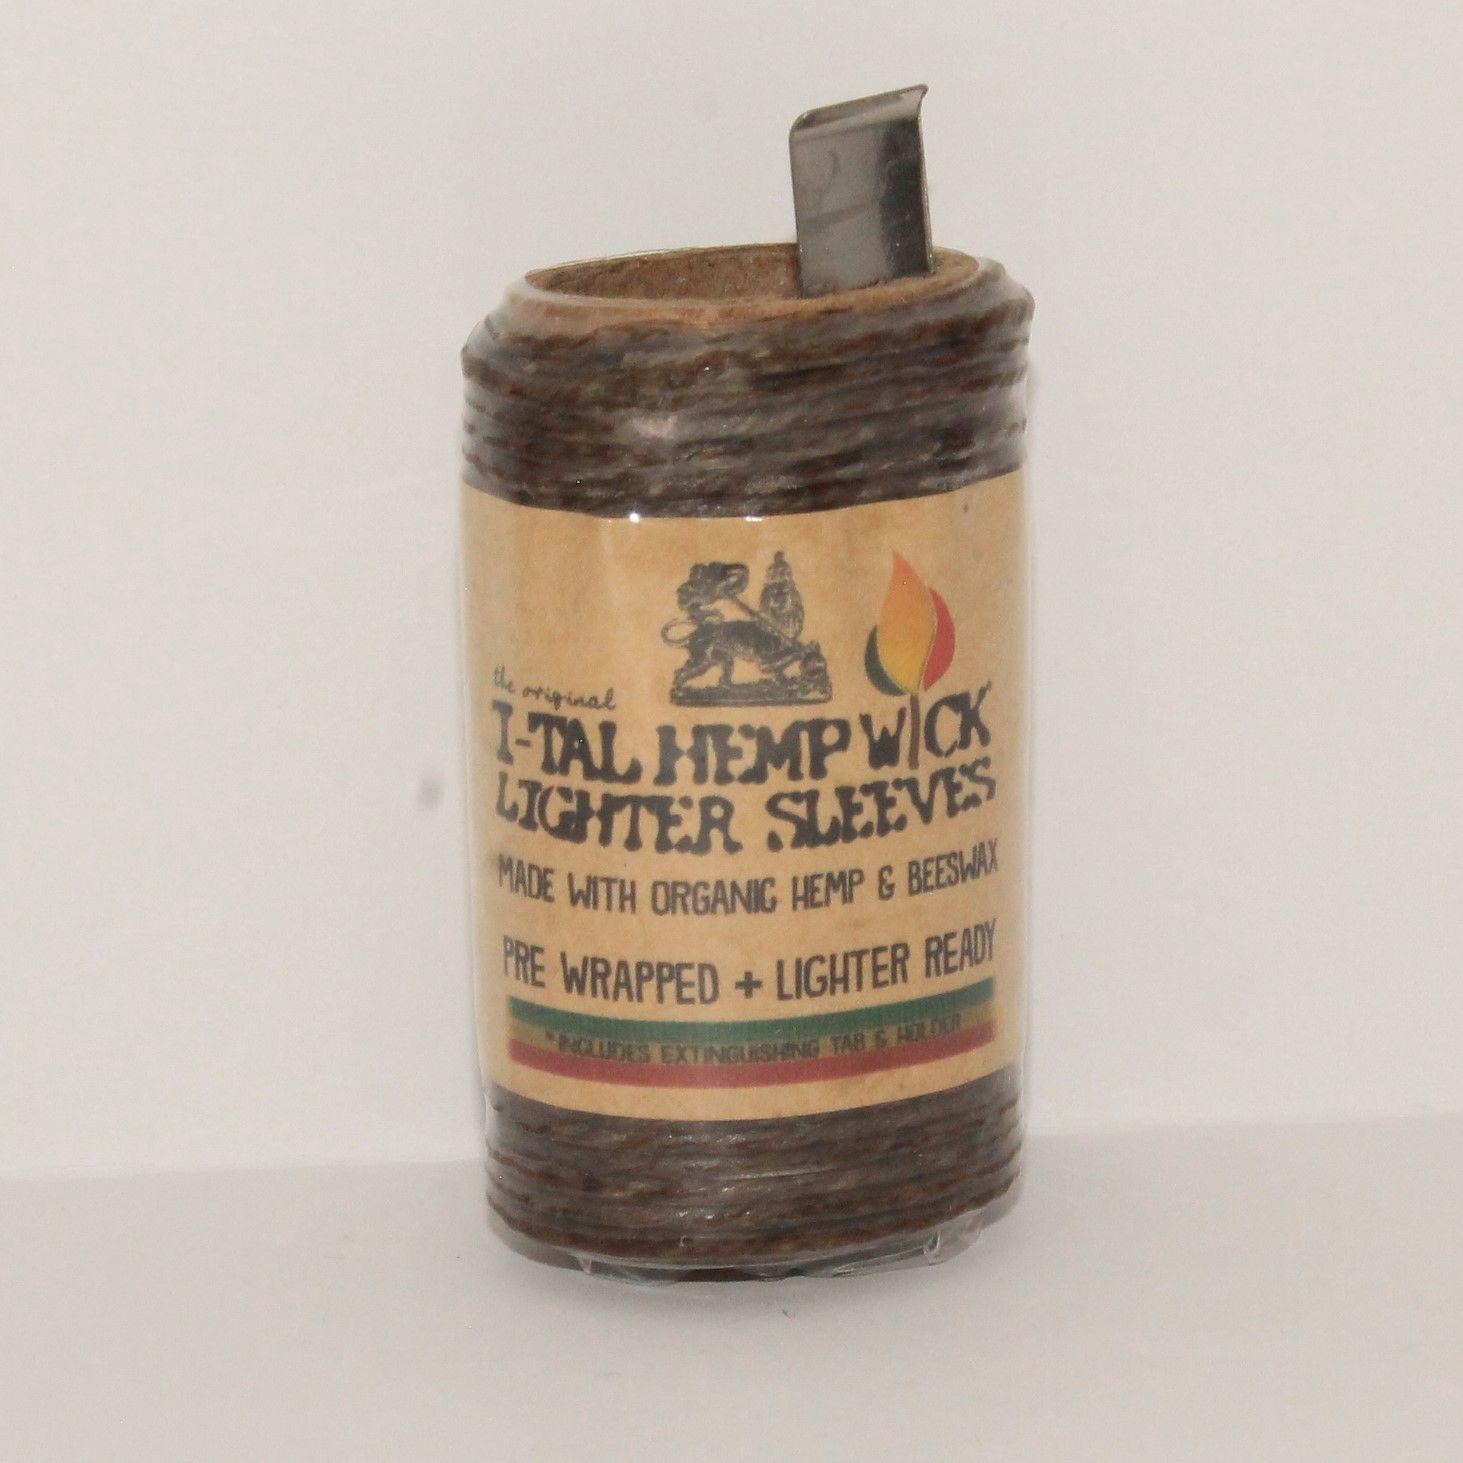 I-Tal Hempwick - Lighter Sleeve